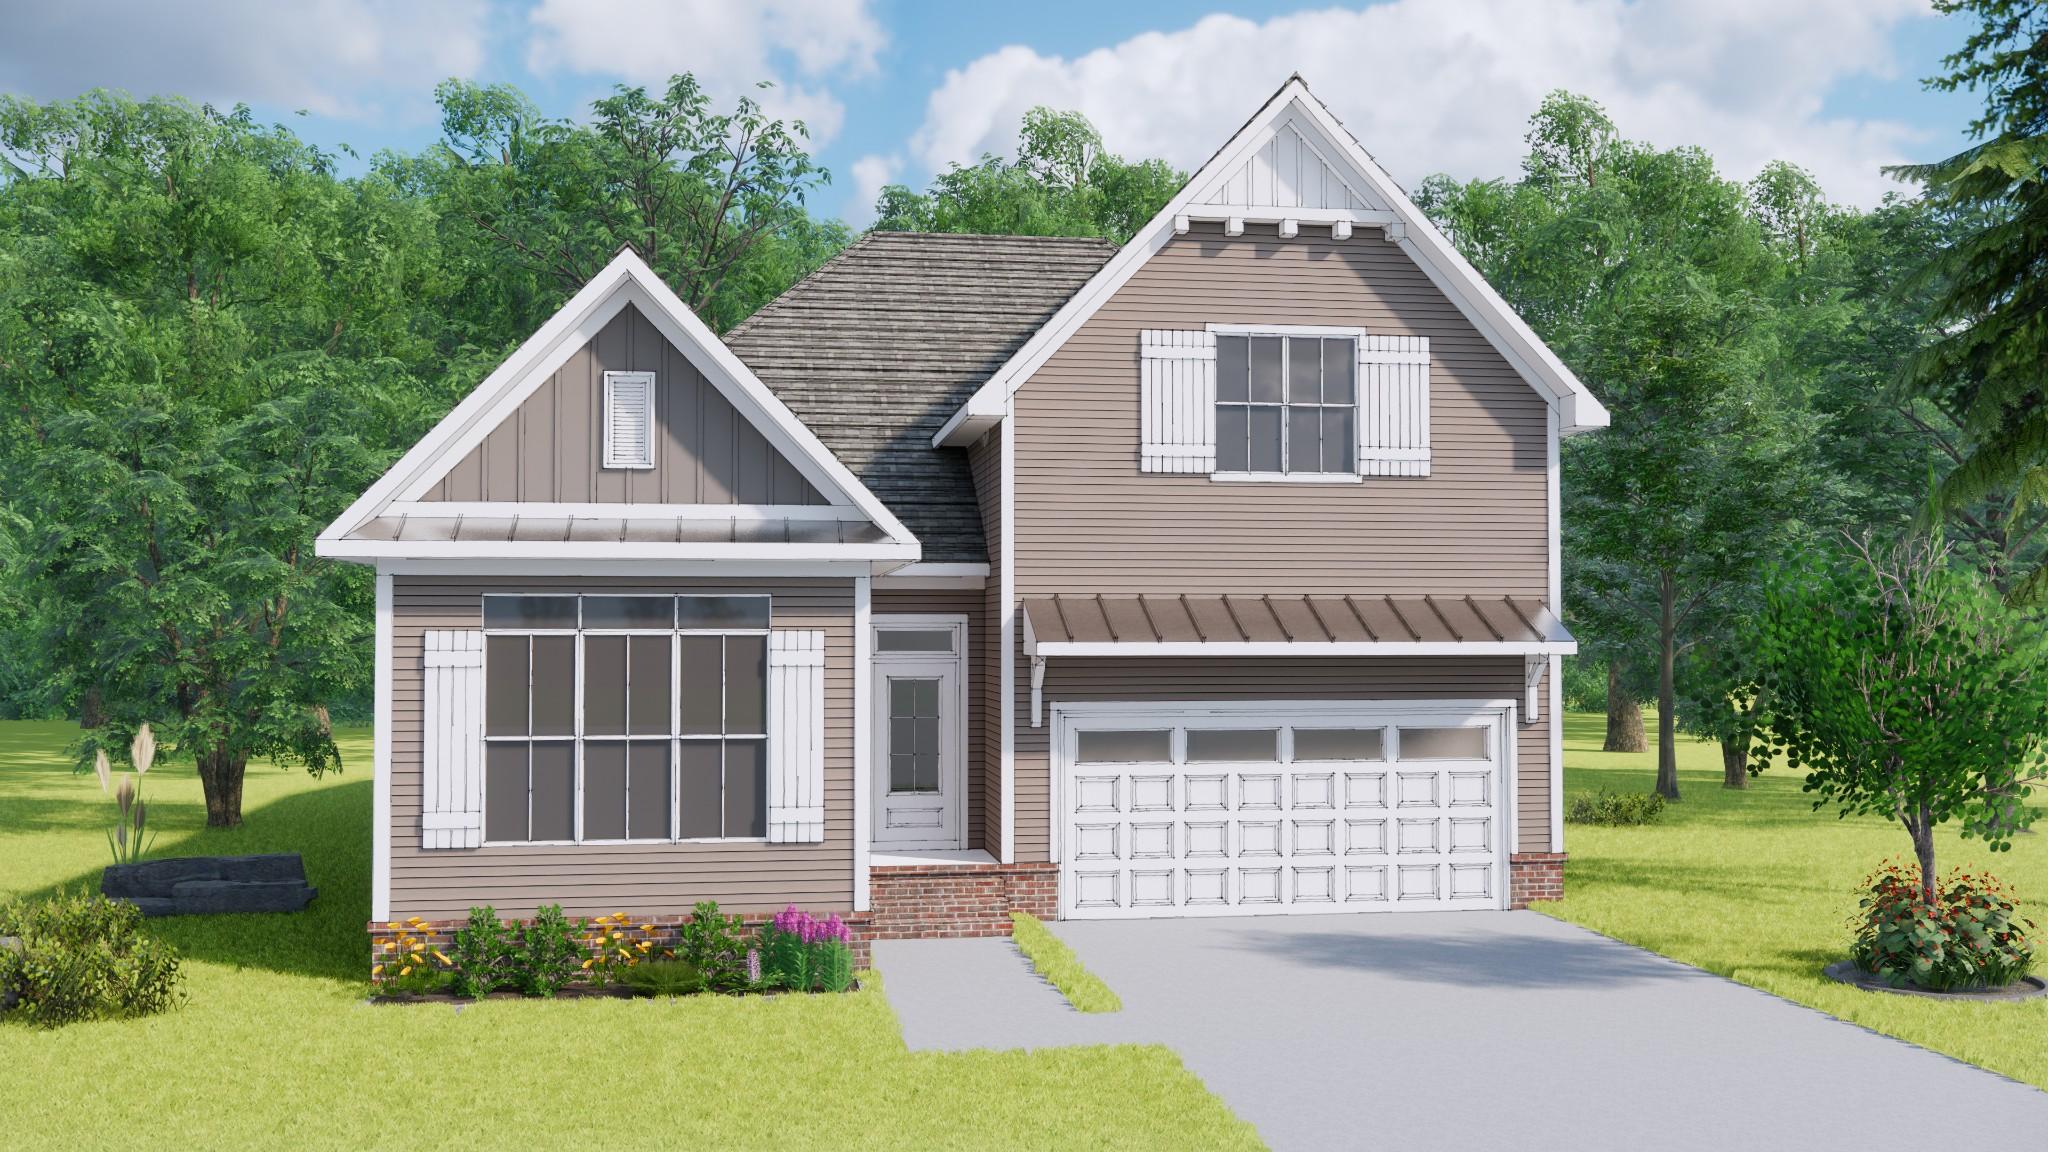 162 Lenham Dr Property Photo - Brentwood, TN real estate listing